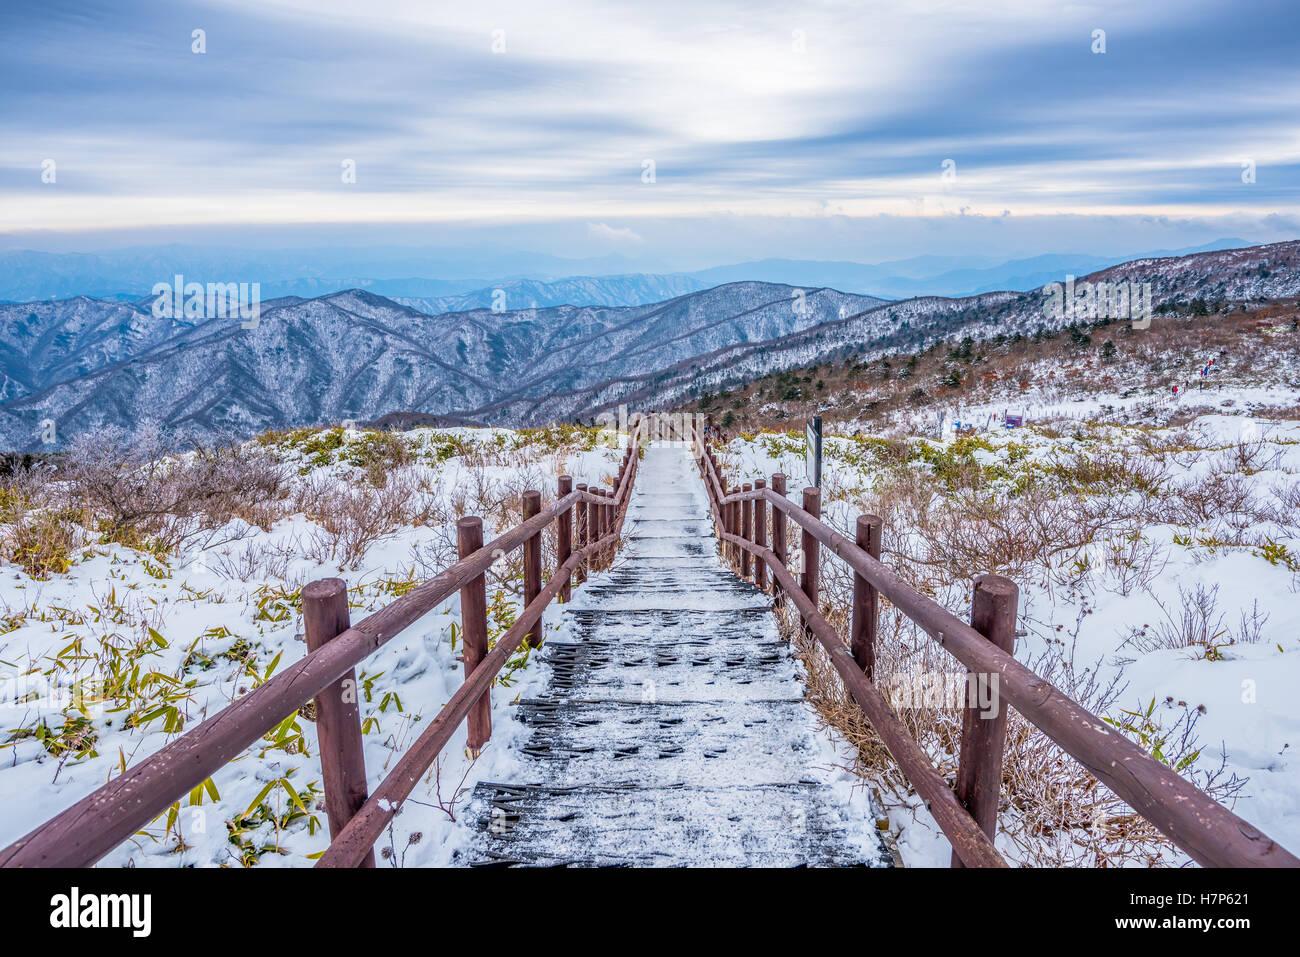 Winter landscape white snow of Mountain in Korea - Stock Image